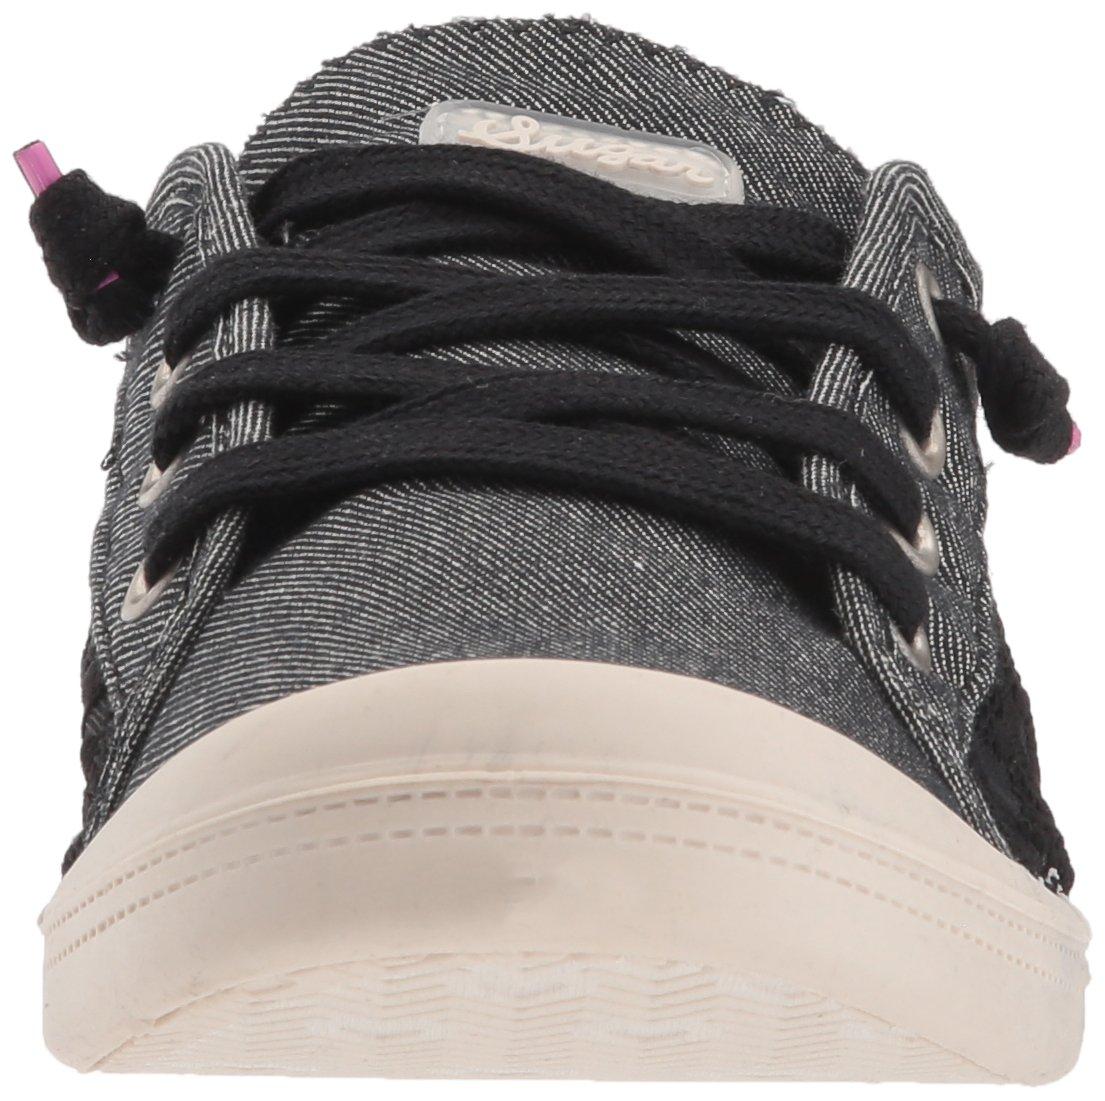 Sugar Women's Genius Casual Fashion Sneaker B0764TJPPS 8 B(M) US|Black Mesh Lace